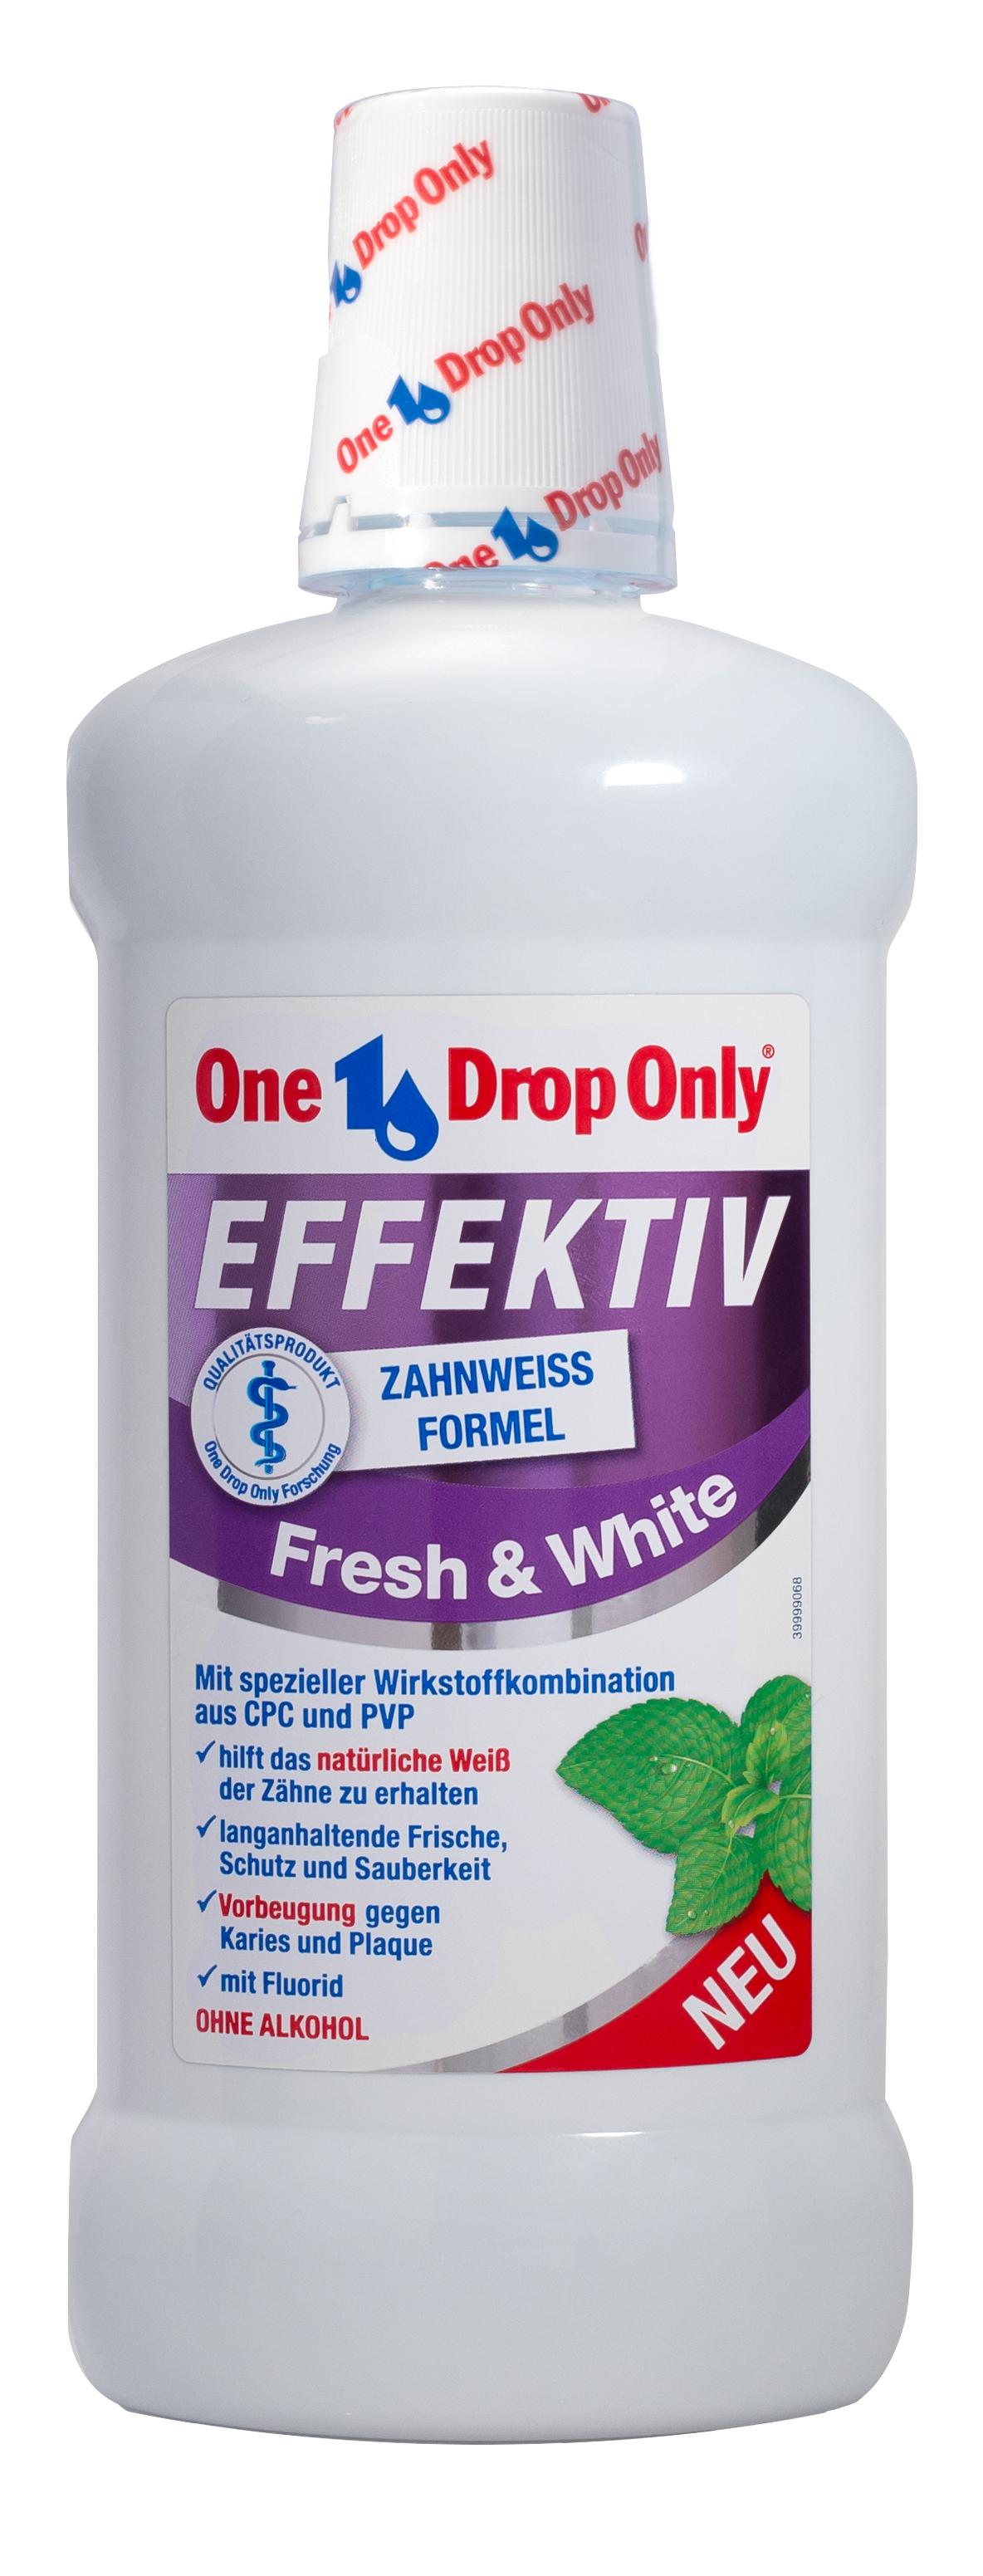 One Drop Only Effektiv Fresh&White Антибактериальный ополаскиватель полости рта, 500 мл